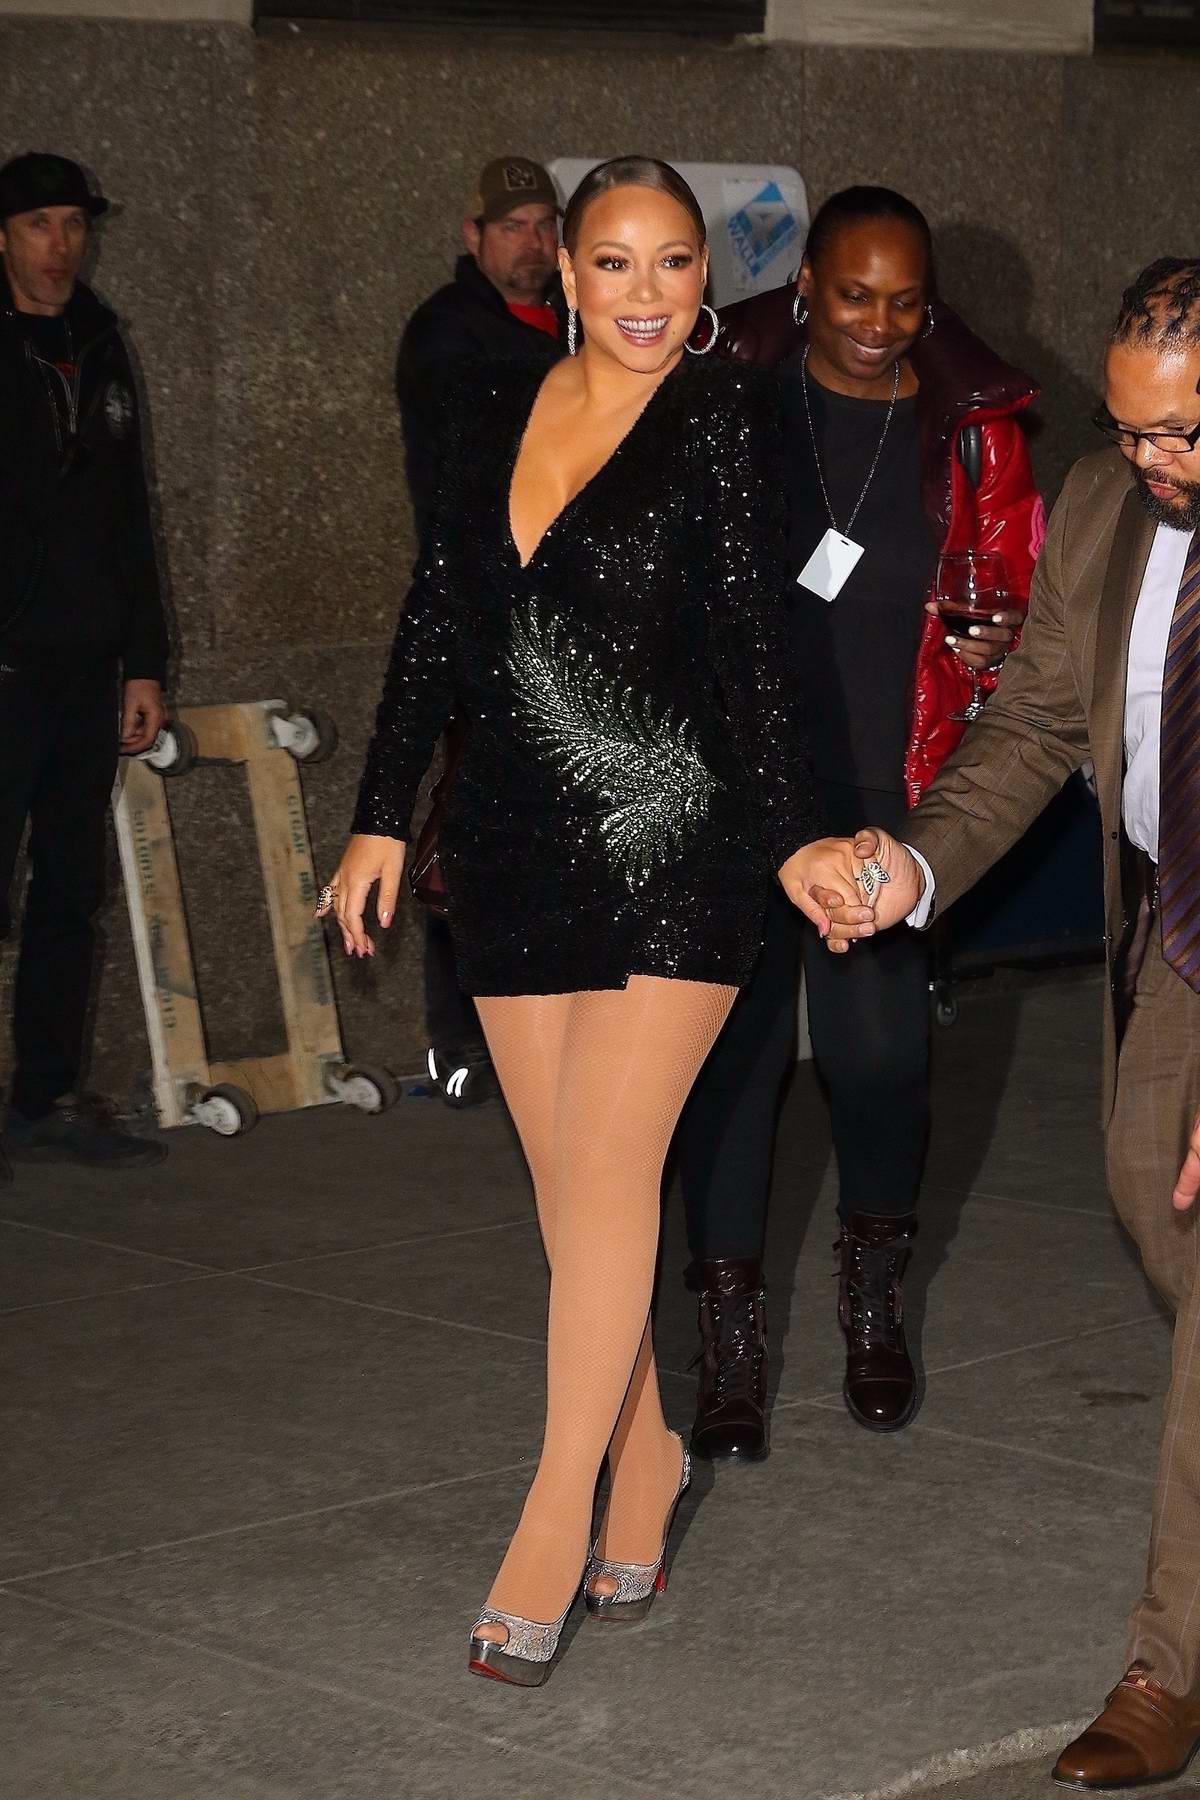 Mariah Carey dons a black mini dress as she leaves Radio City Music Hall in New York City